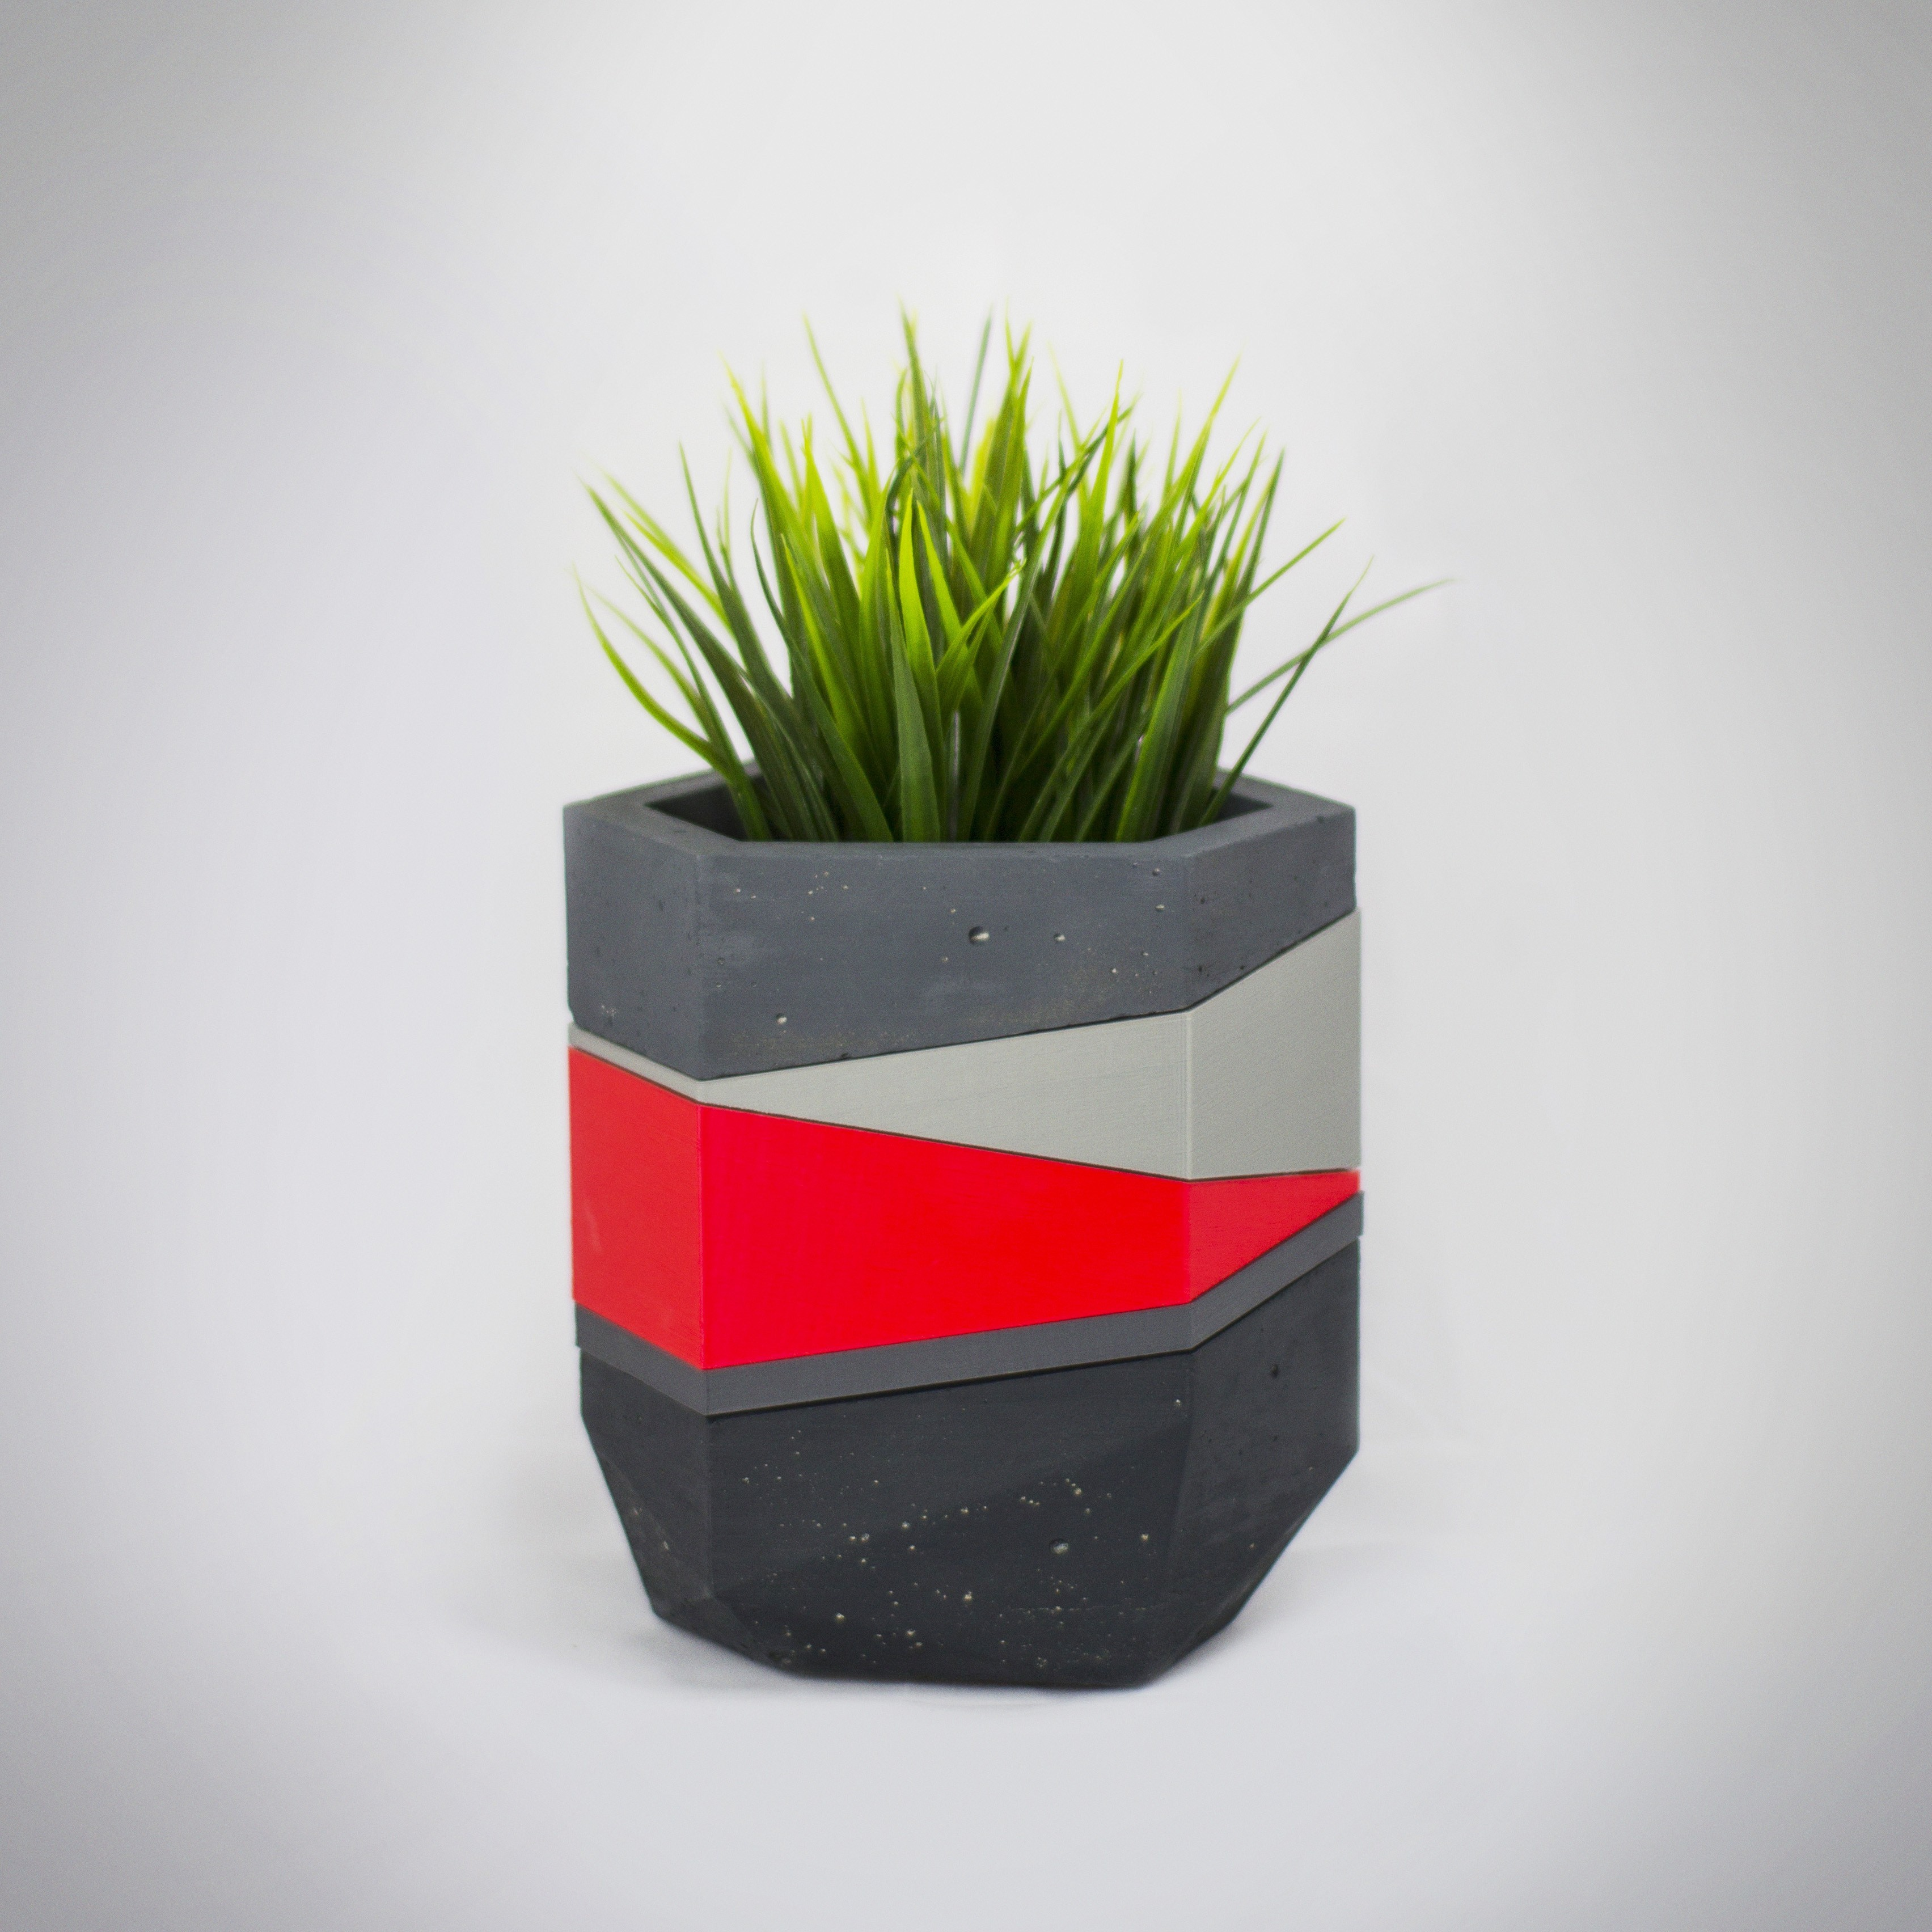 Macetero 6 insta.jpg Download free STL file Concrete Planters Mold • 3D print model, dukedoks